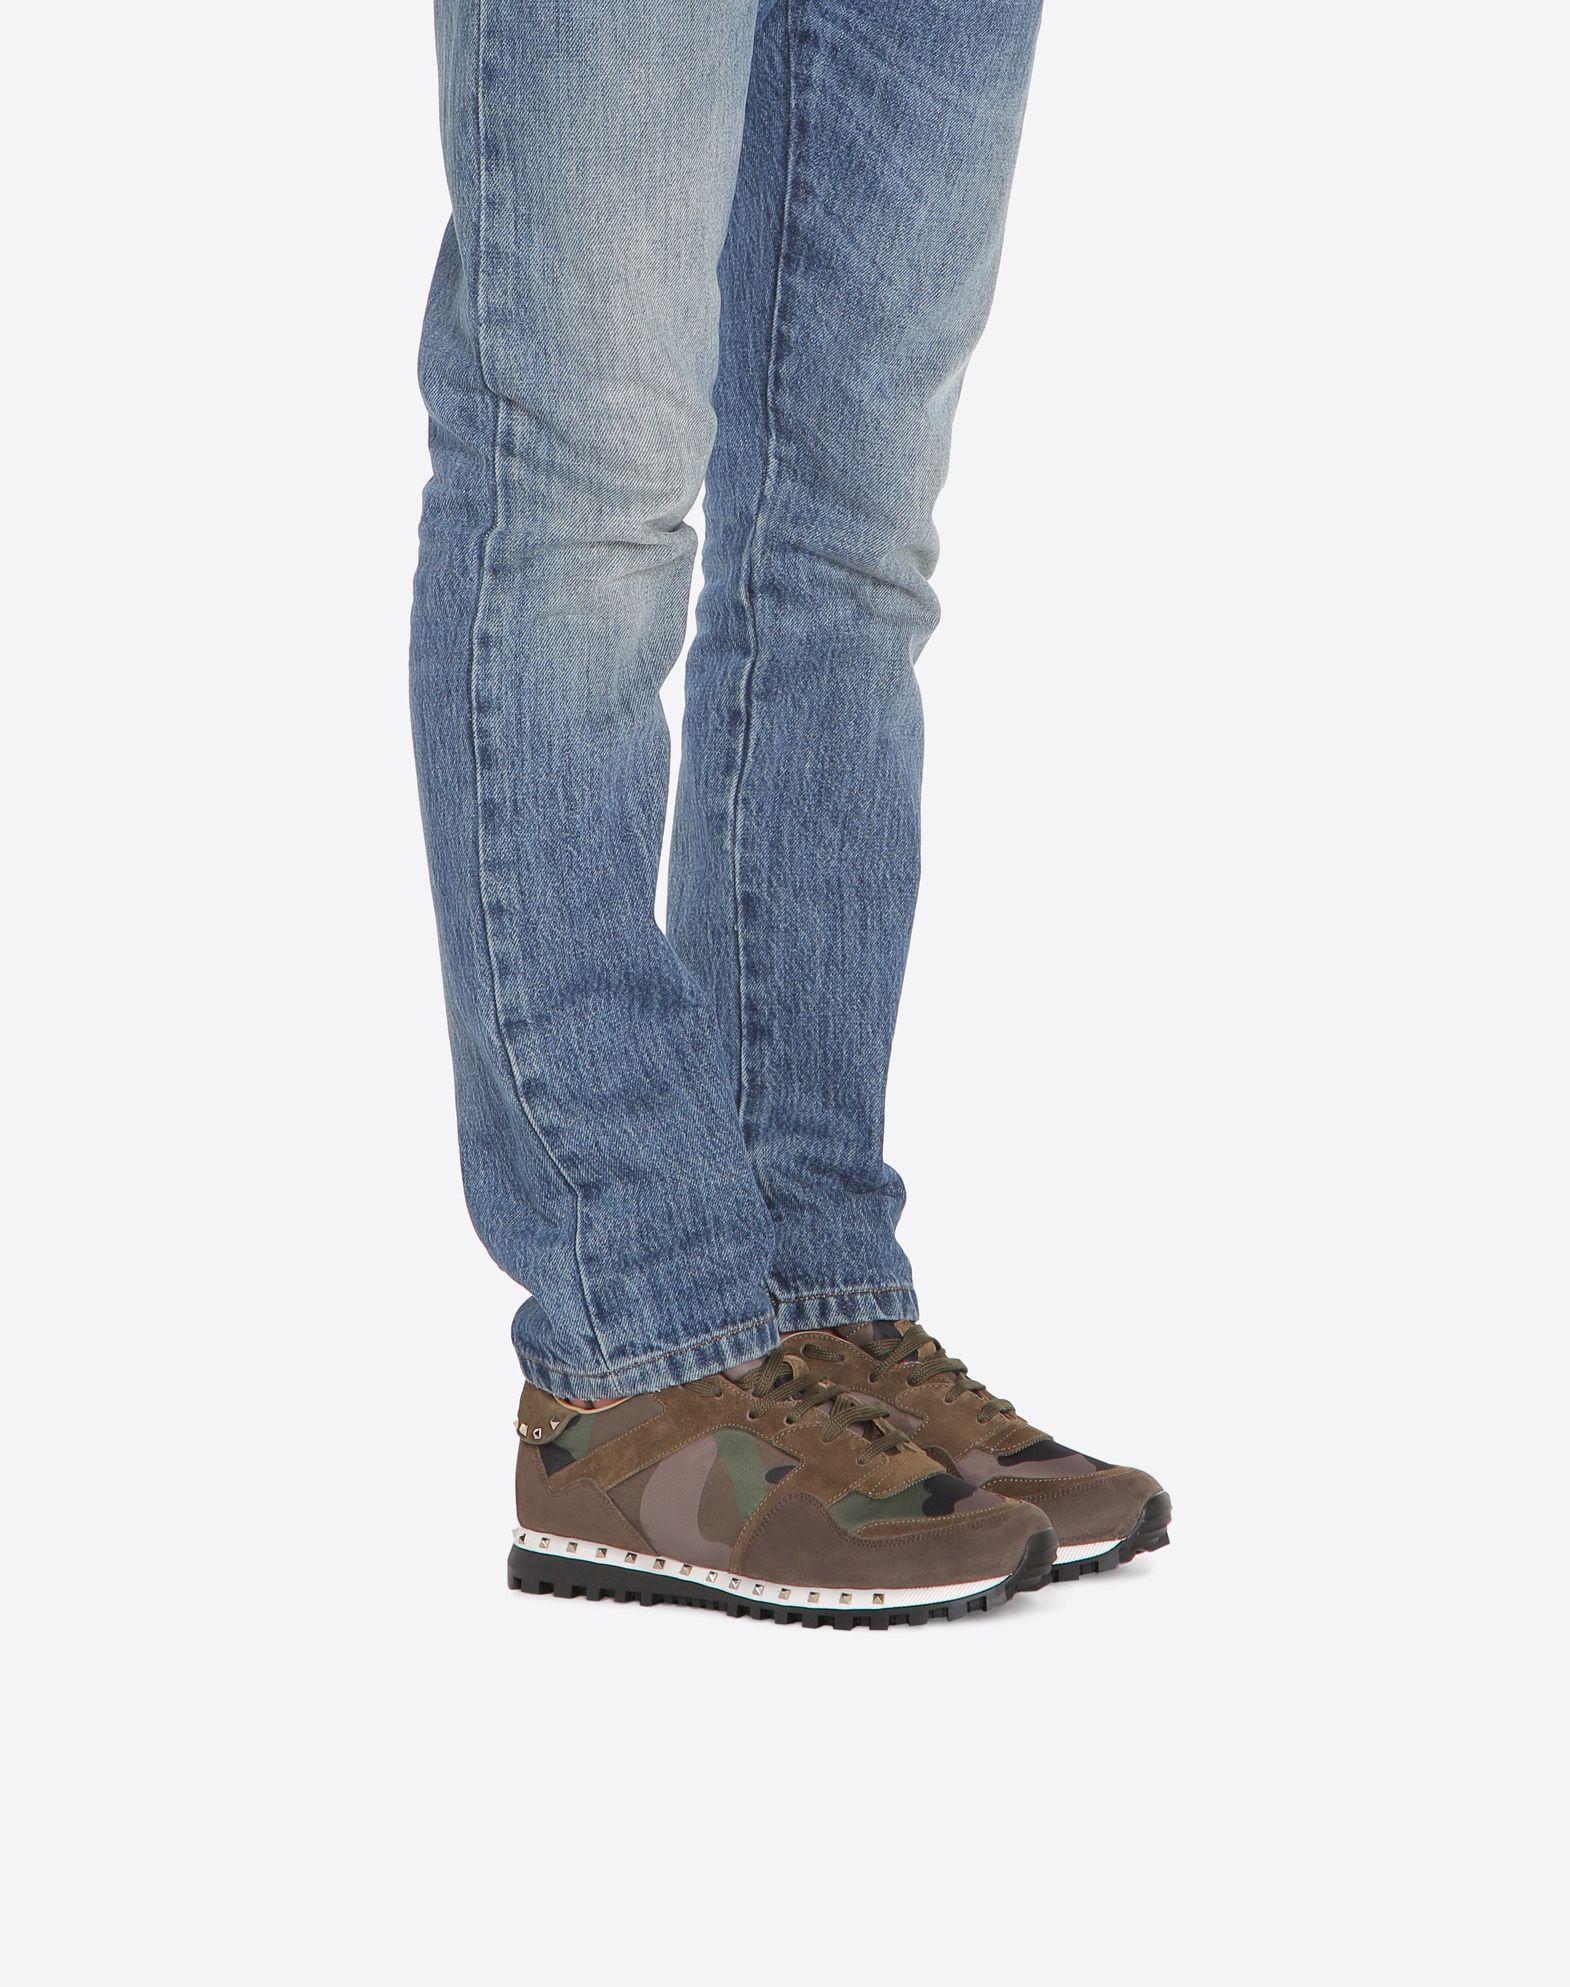 VALENTINO GARAVANI UOMO Camouflage Sneaker LOW-TOP SNEAKERS U a